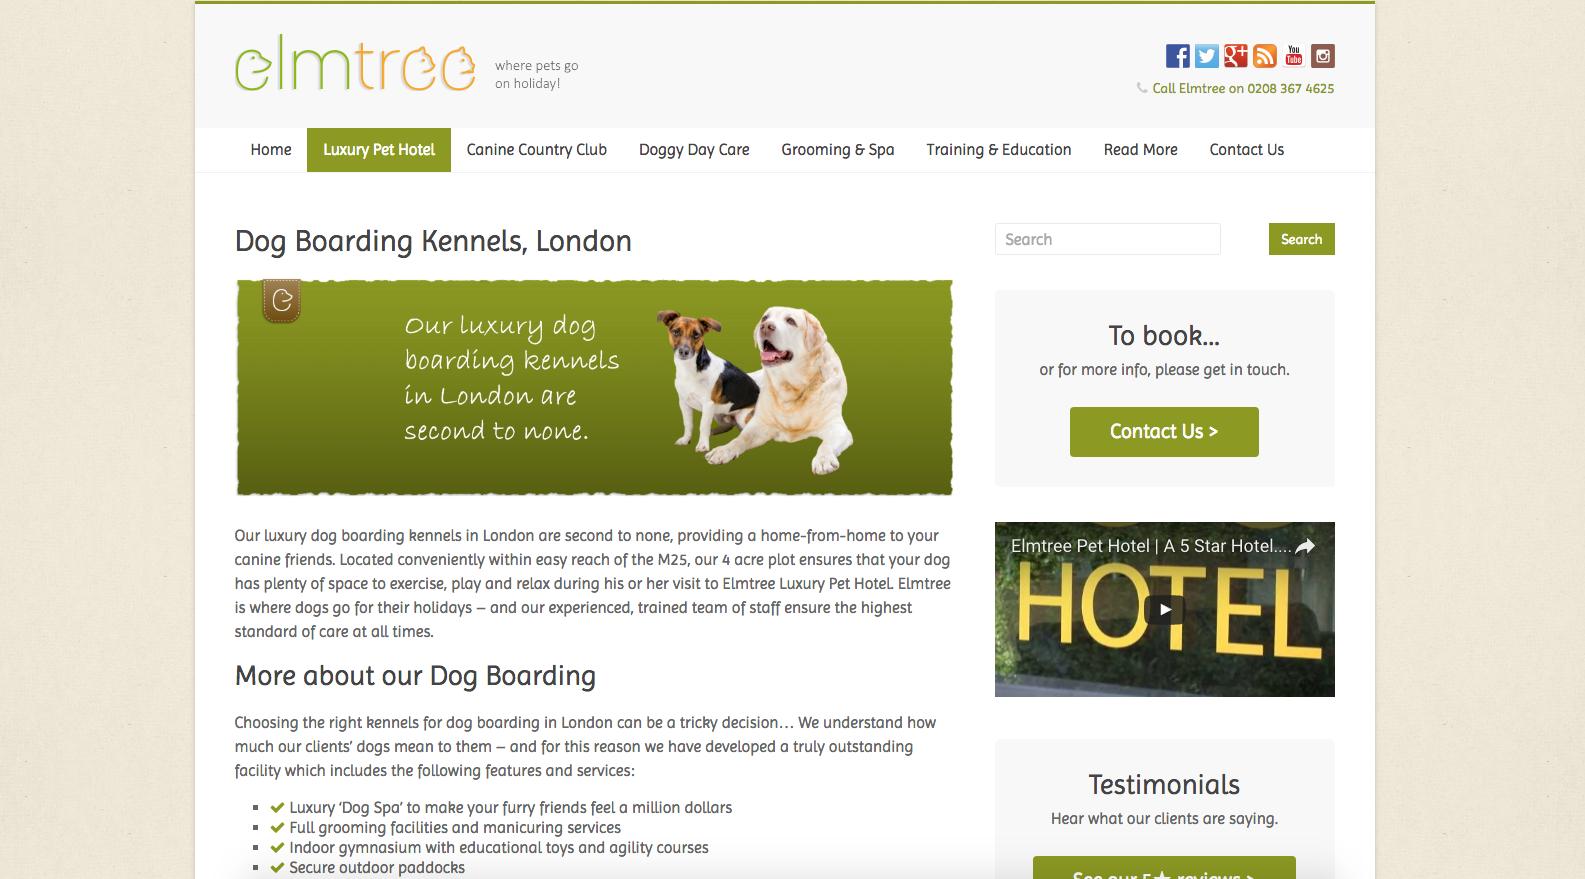 The New Elmtree Pet Hotel Website